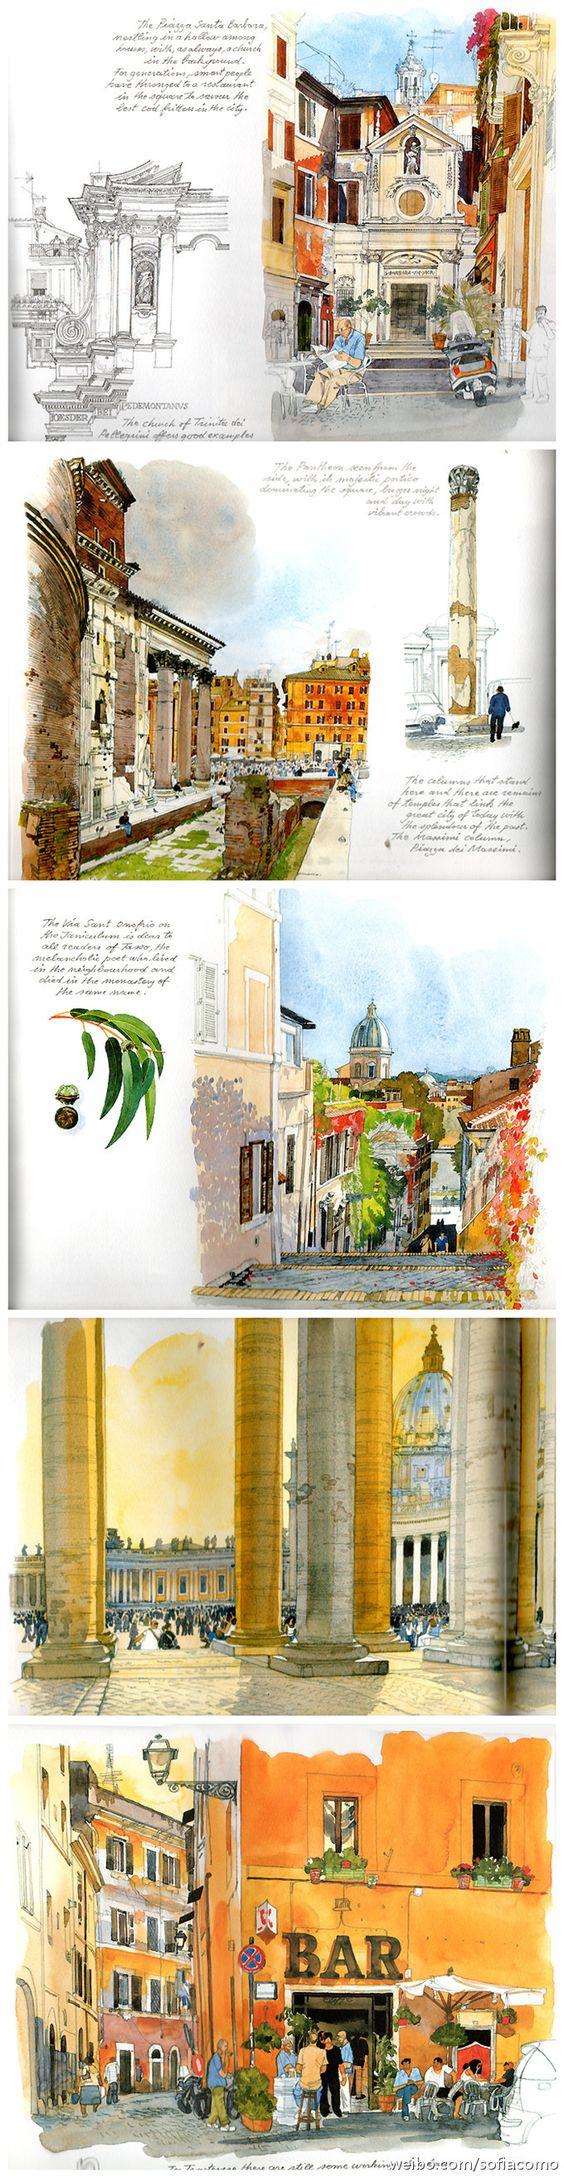 Travelers Journal Version Voyages, www.versionvoyages.fr #FredericClad